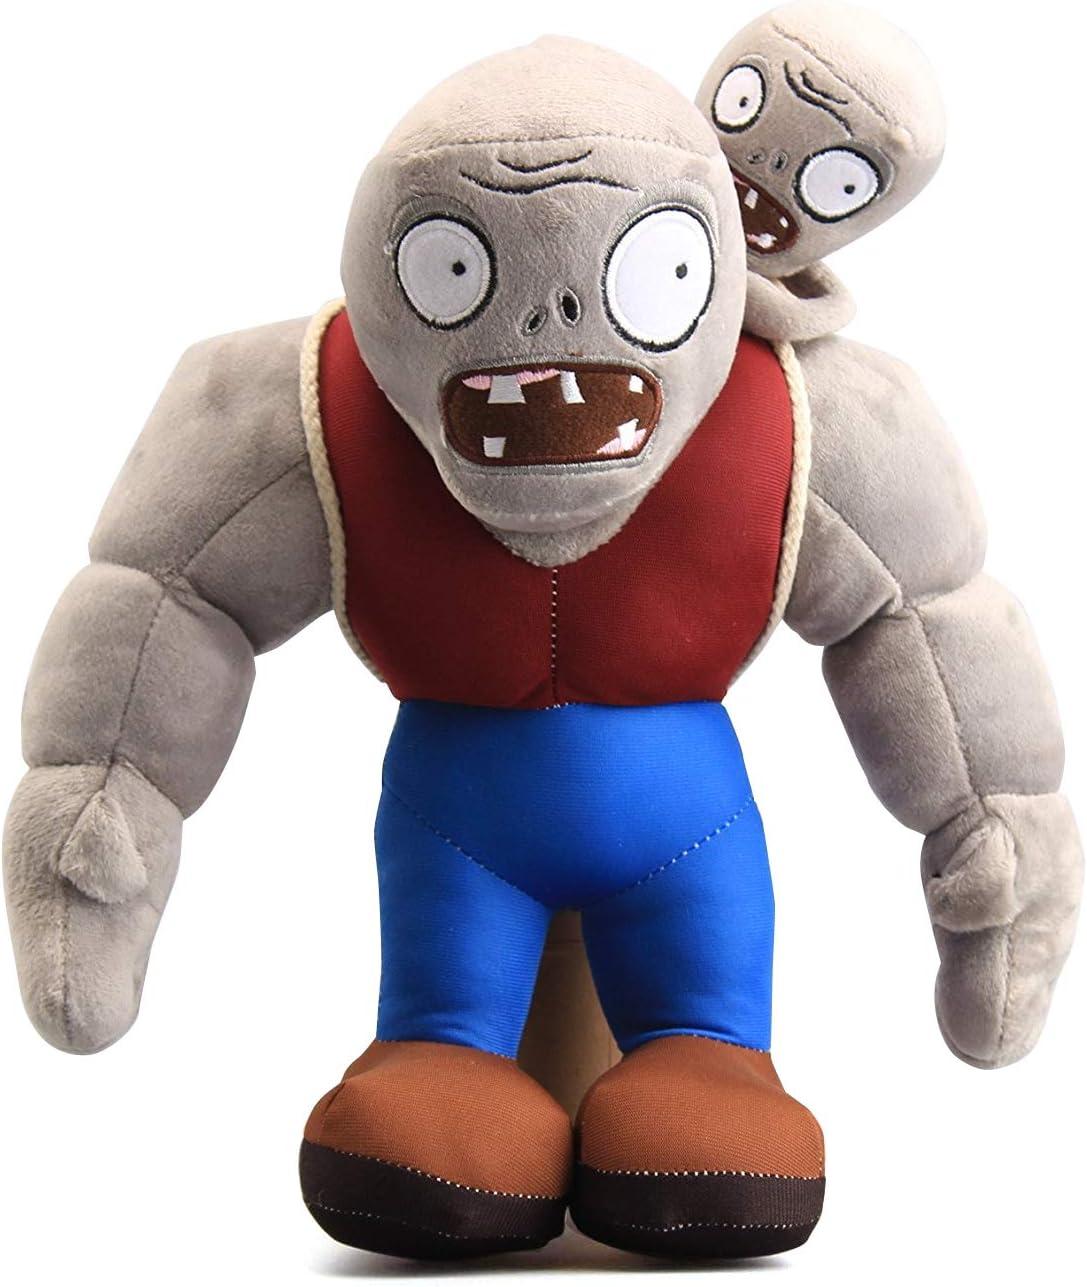 "Maikerry 12"" PVZ Gargantuar Zombies Plush Toys Stuffed Soft Doll Muscle Zombies"